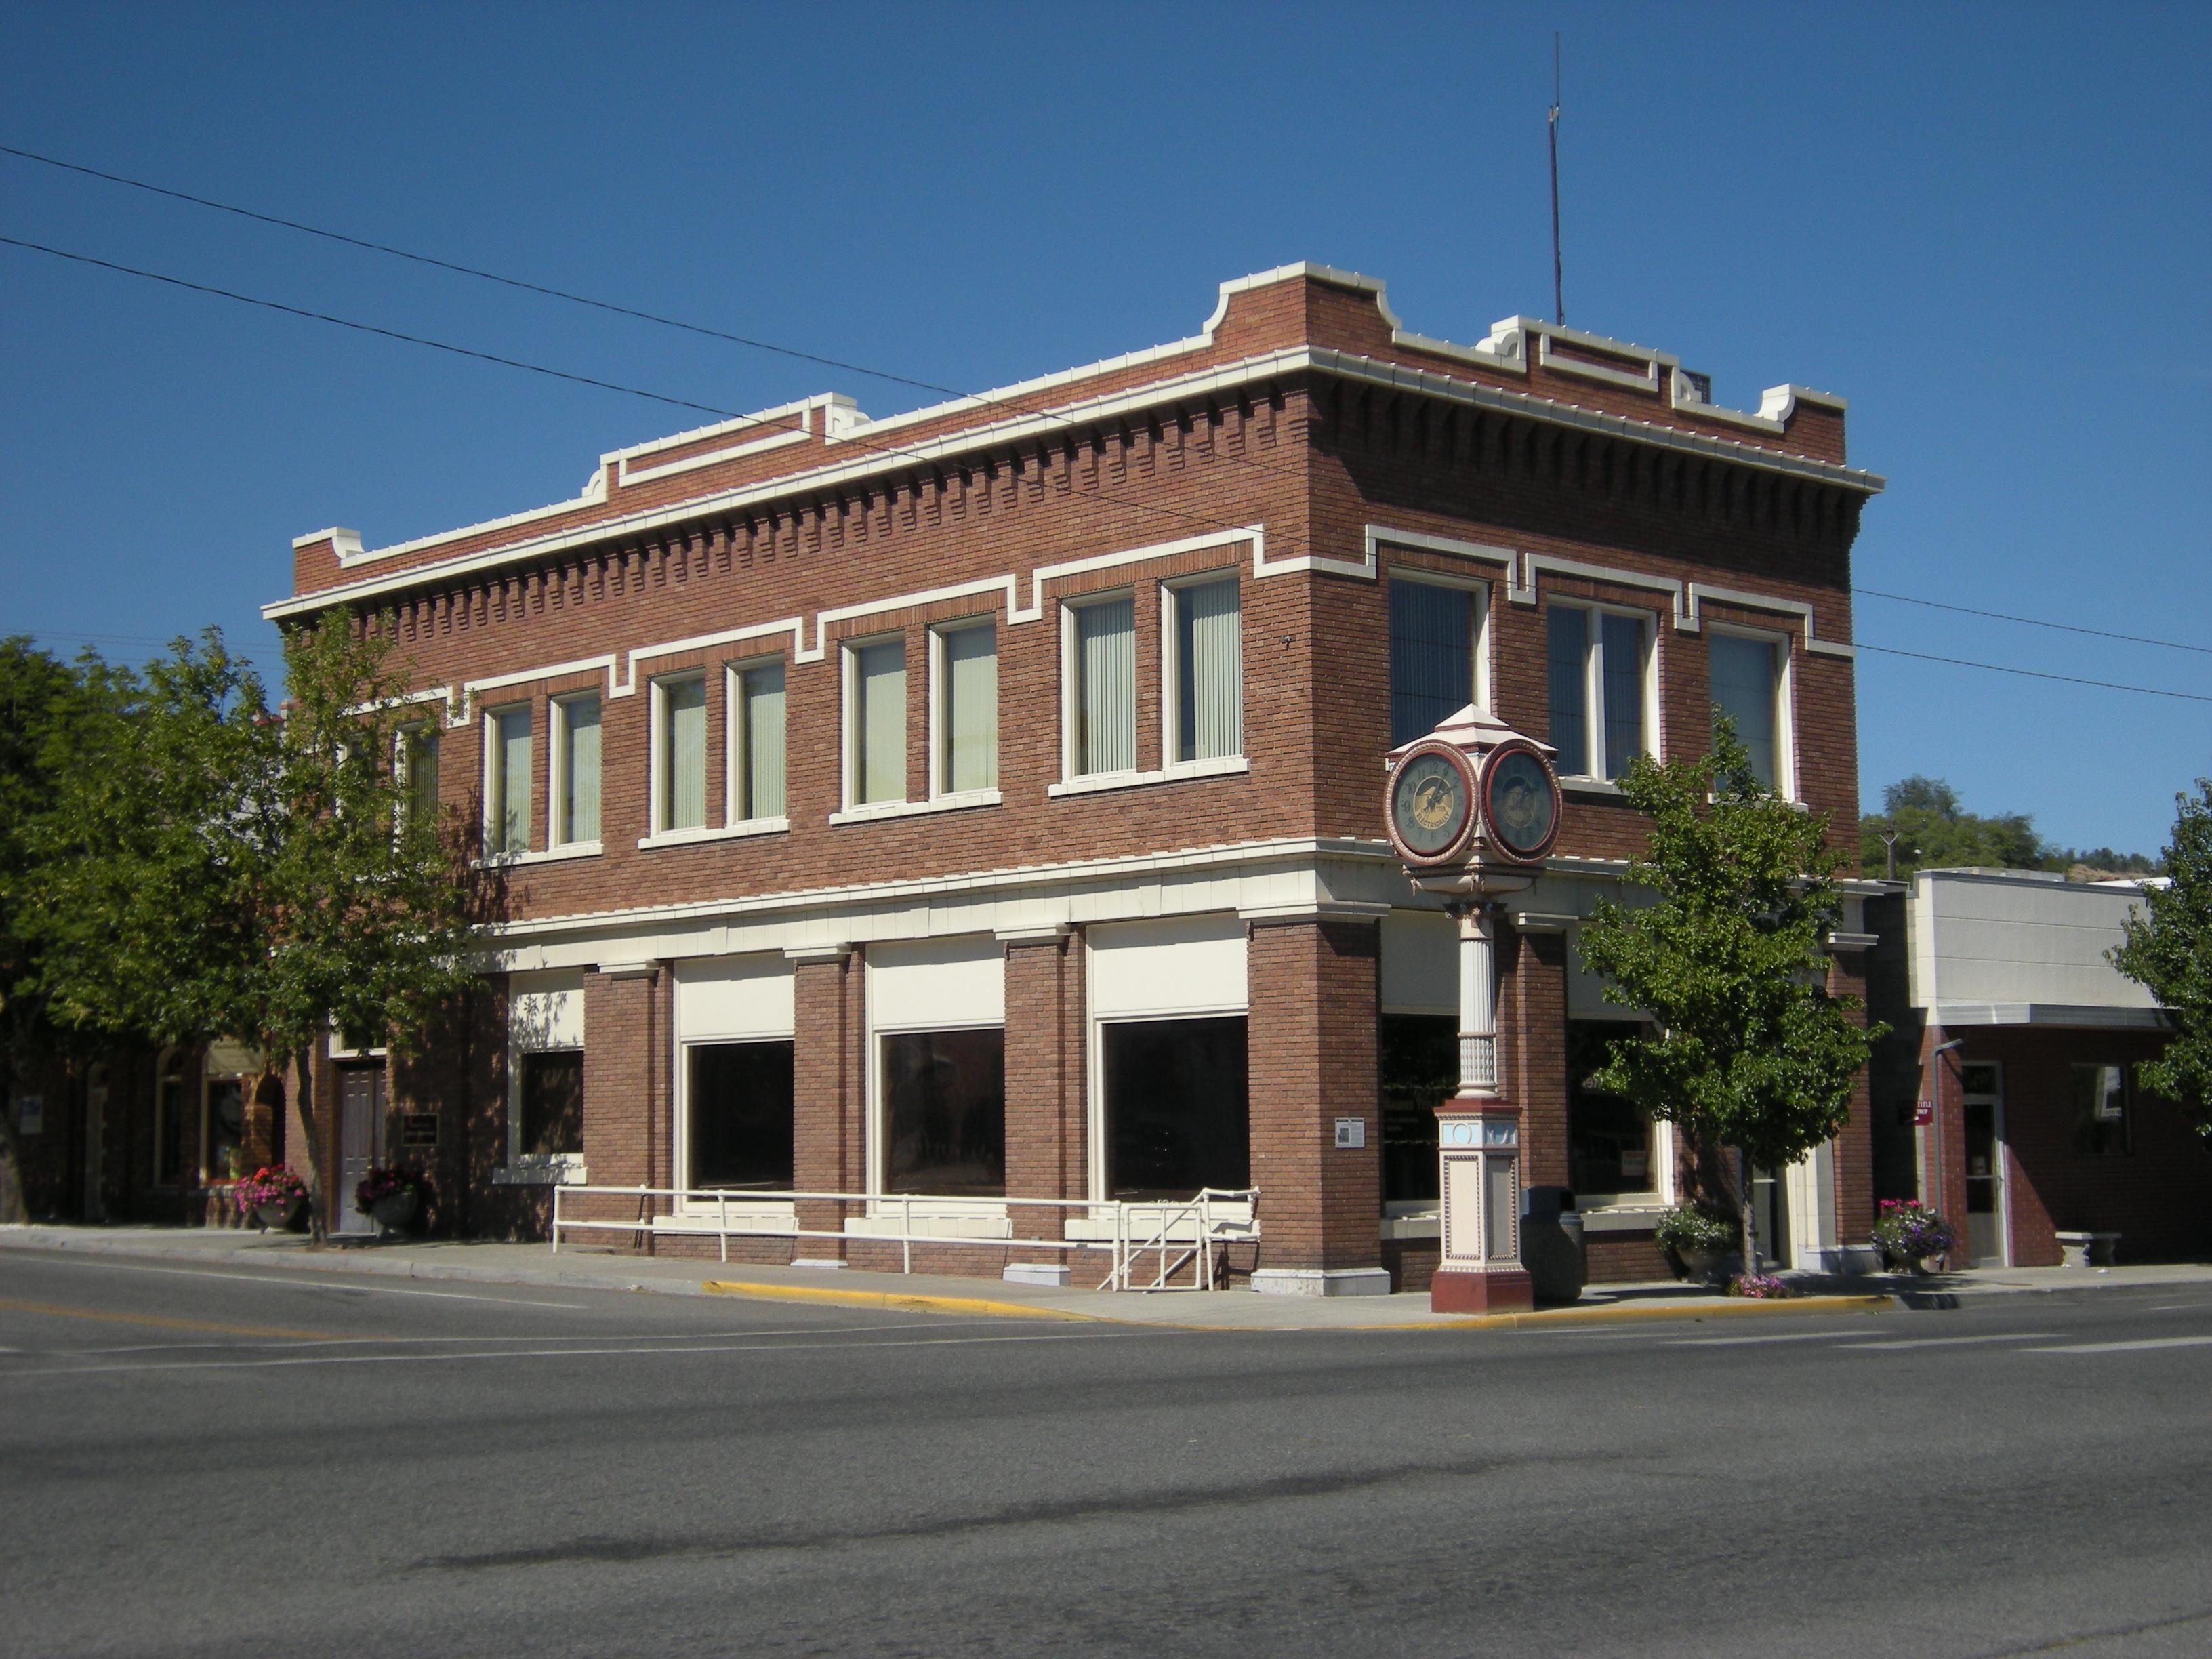 File:Okanogan, WA - Commercial Building.jpg - Wikimedia ...